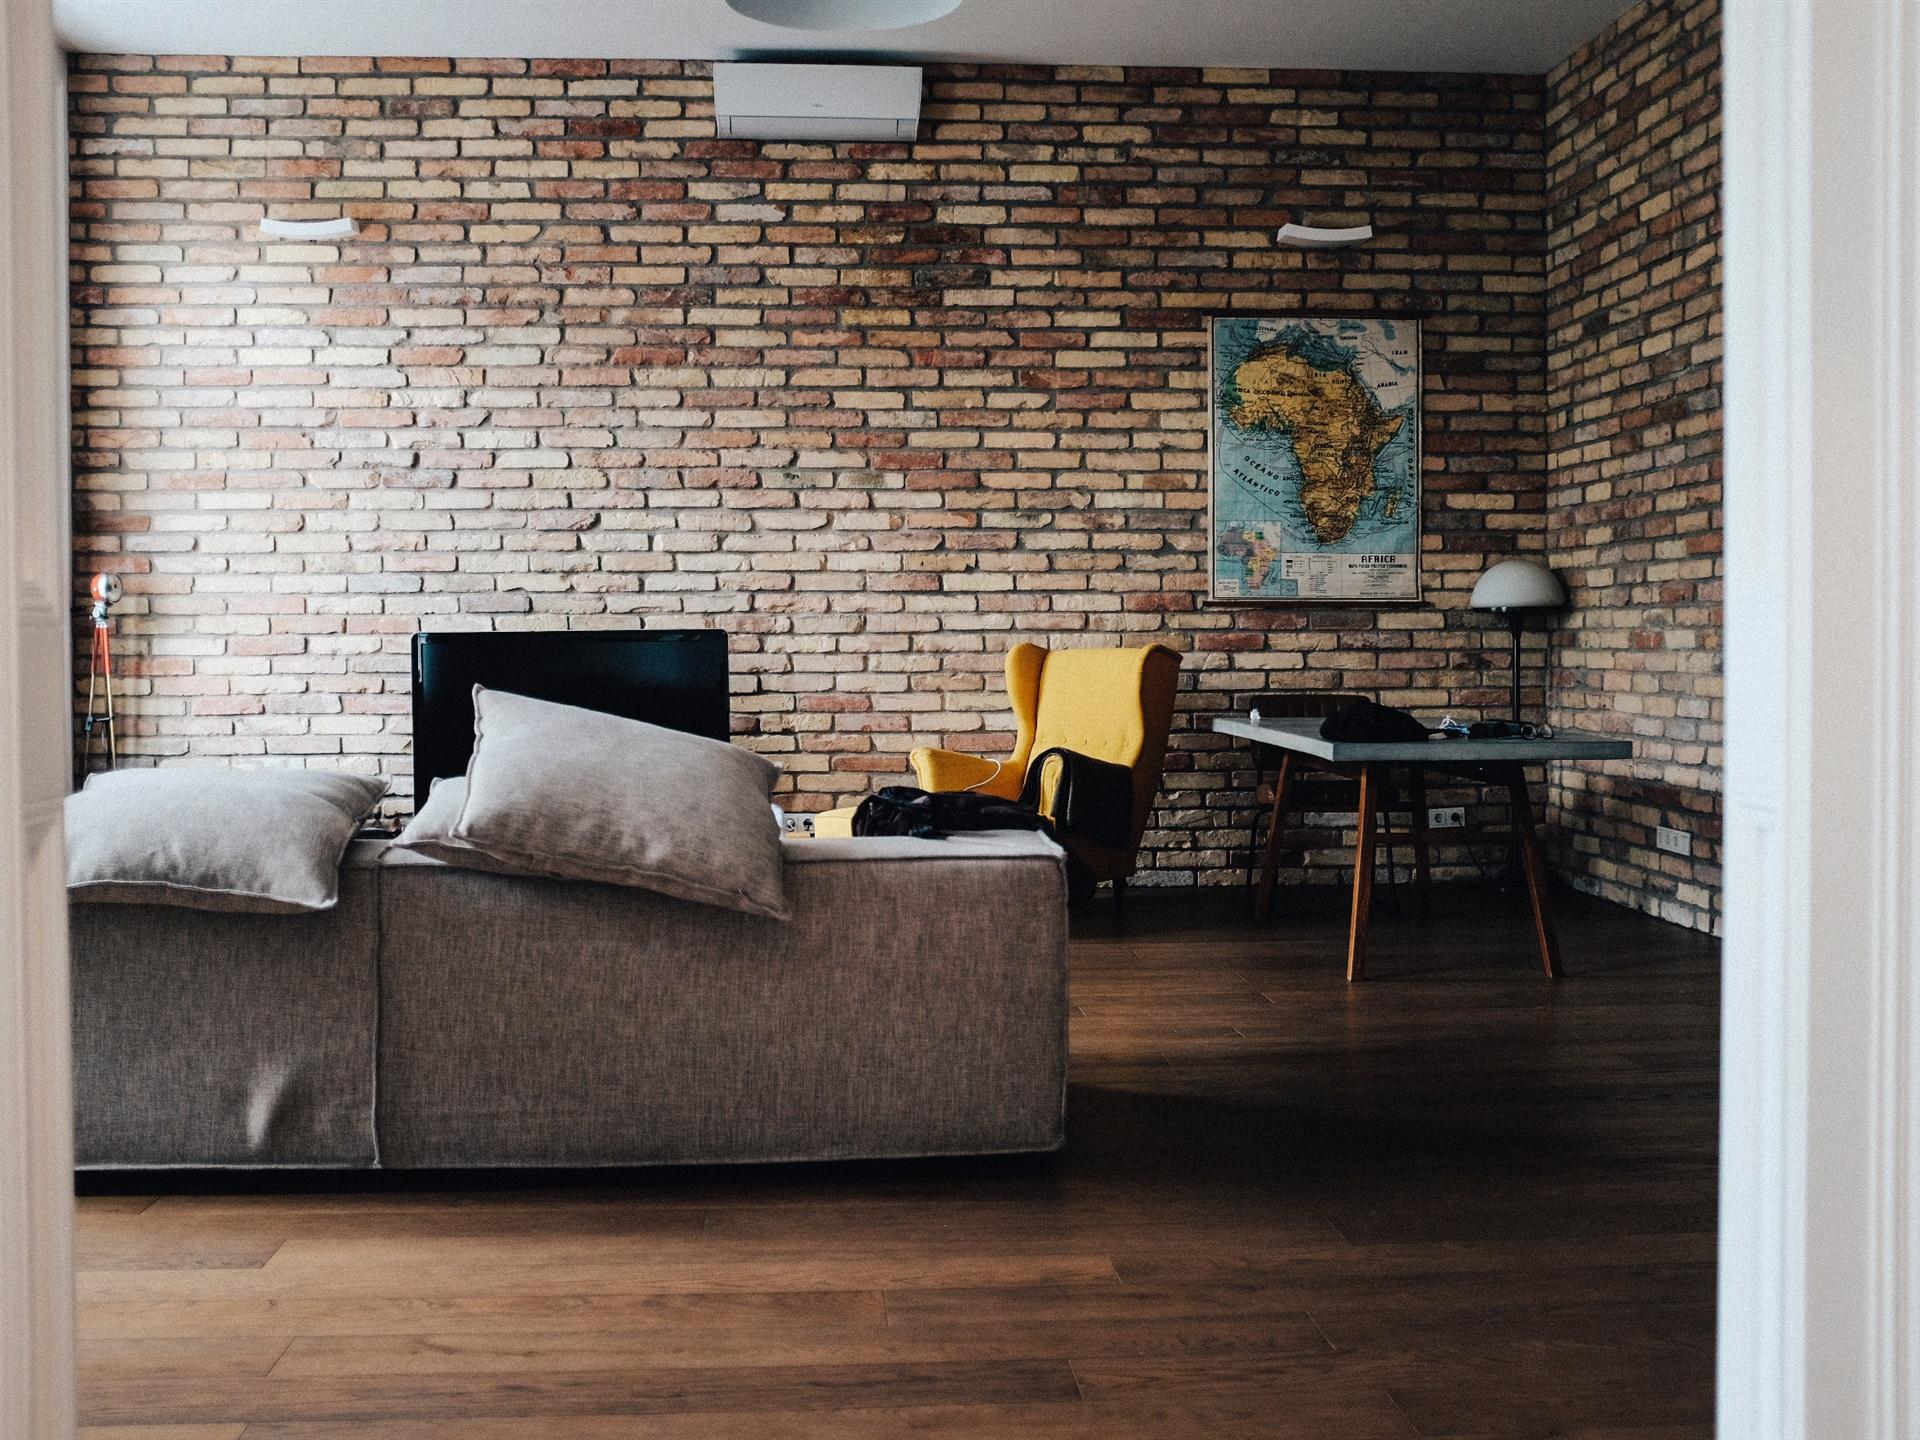 https://de.best-wallpaper.net/wallpaper/1920x1440/1705/Room-sofa-interior_1920x1440.jpg